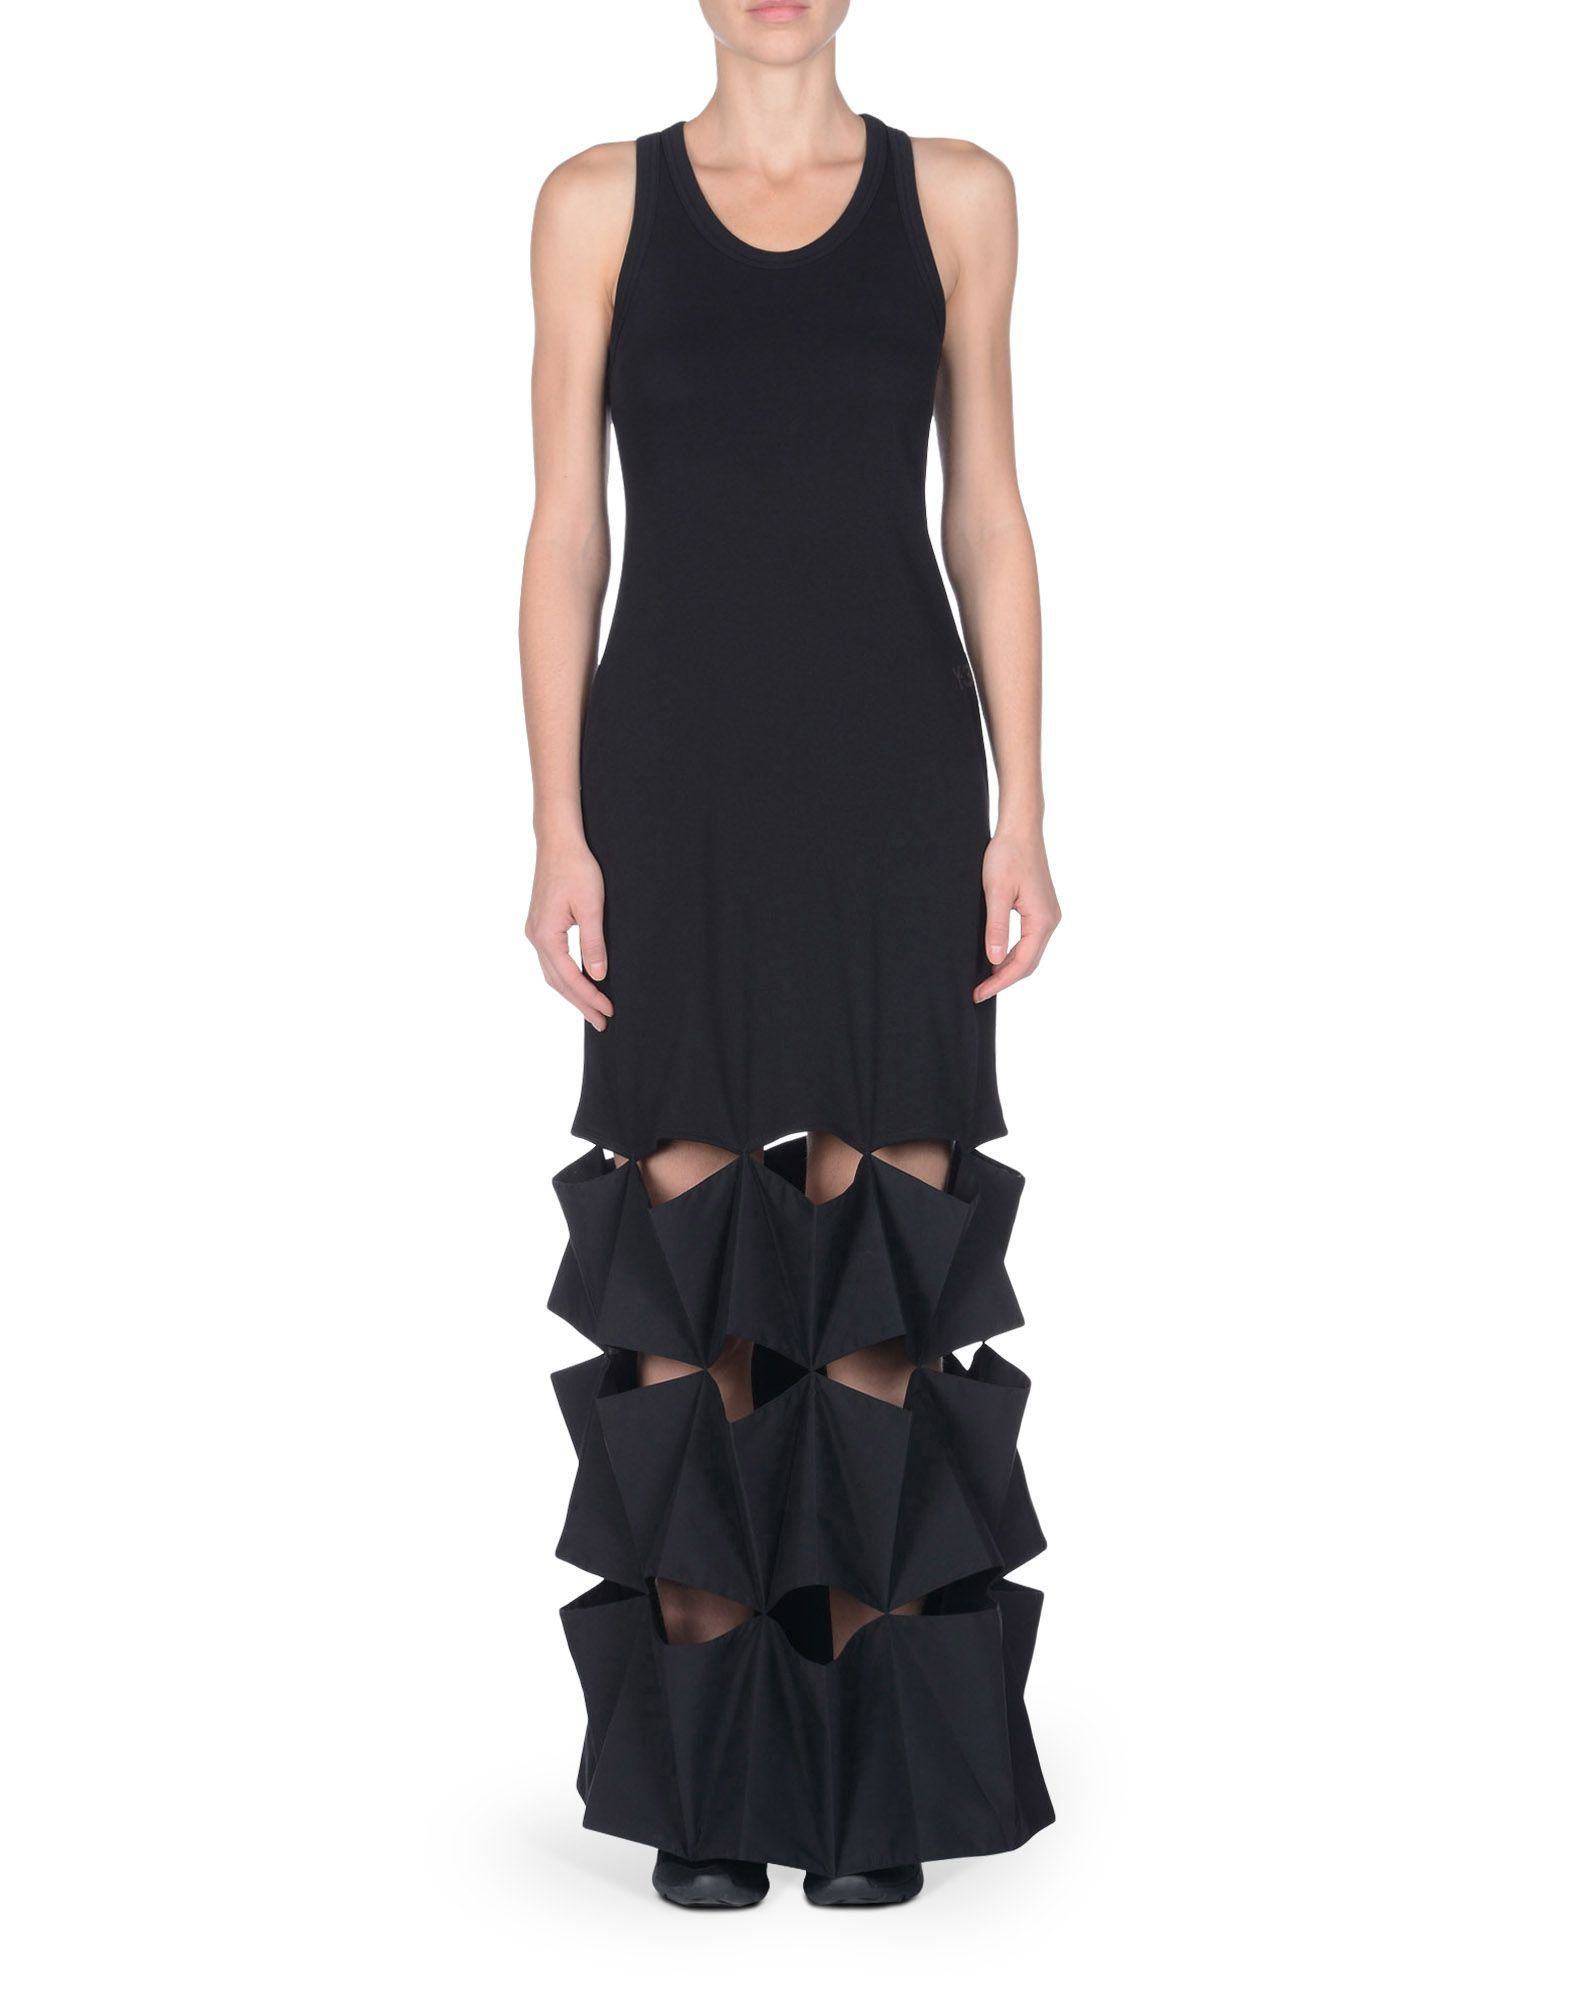 Y-3 FUTURE CRAFT DRESS DRESSES & SKIRTS woman Y-3 adidas